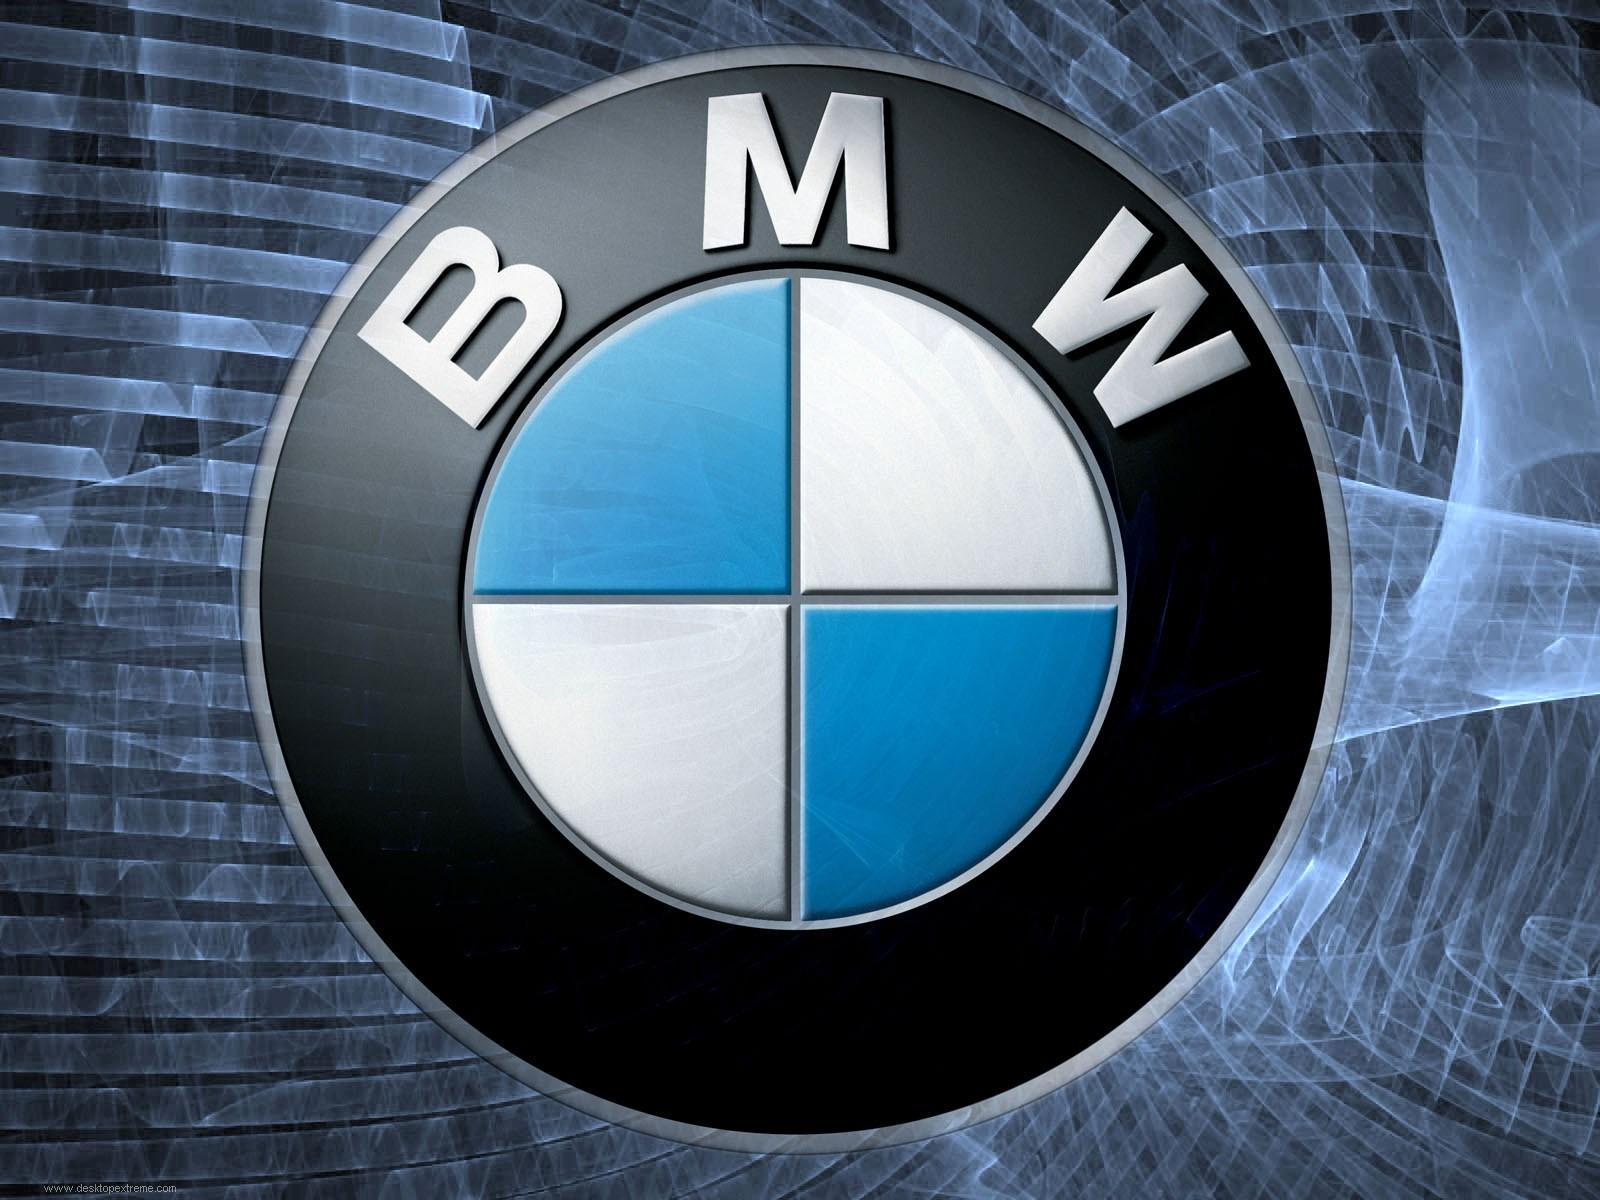 http://1.bp.blogspot.com/-IEc9GxgHD9o/UJlan4siHlI/AAAAAAAAUIs/wNM8QlLgLUU/s1600/BMW-logo%2B1.jpg